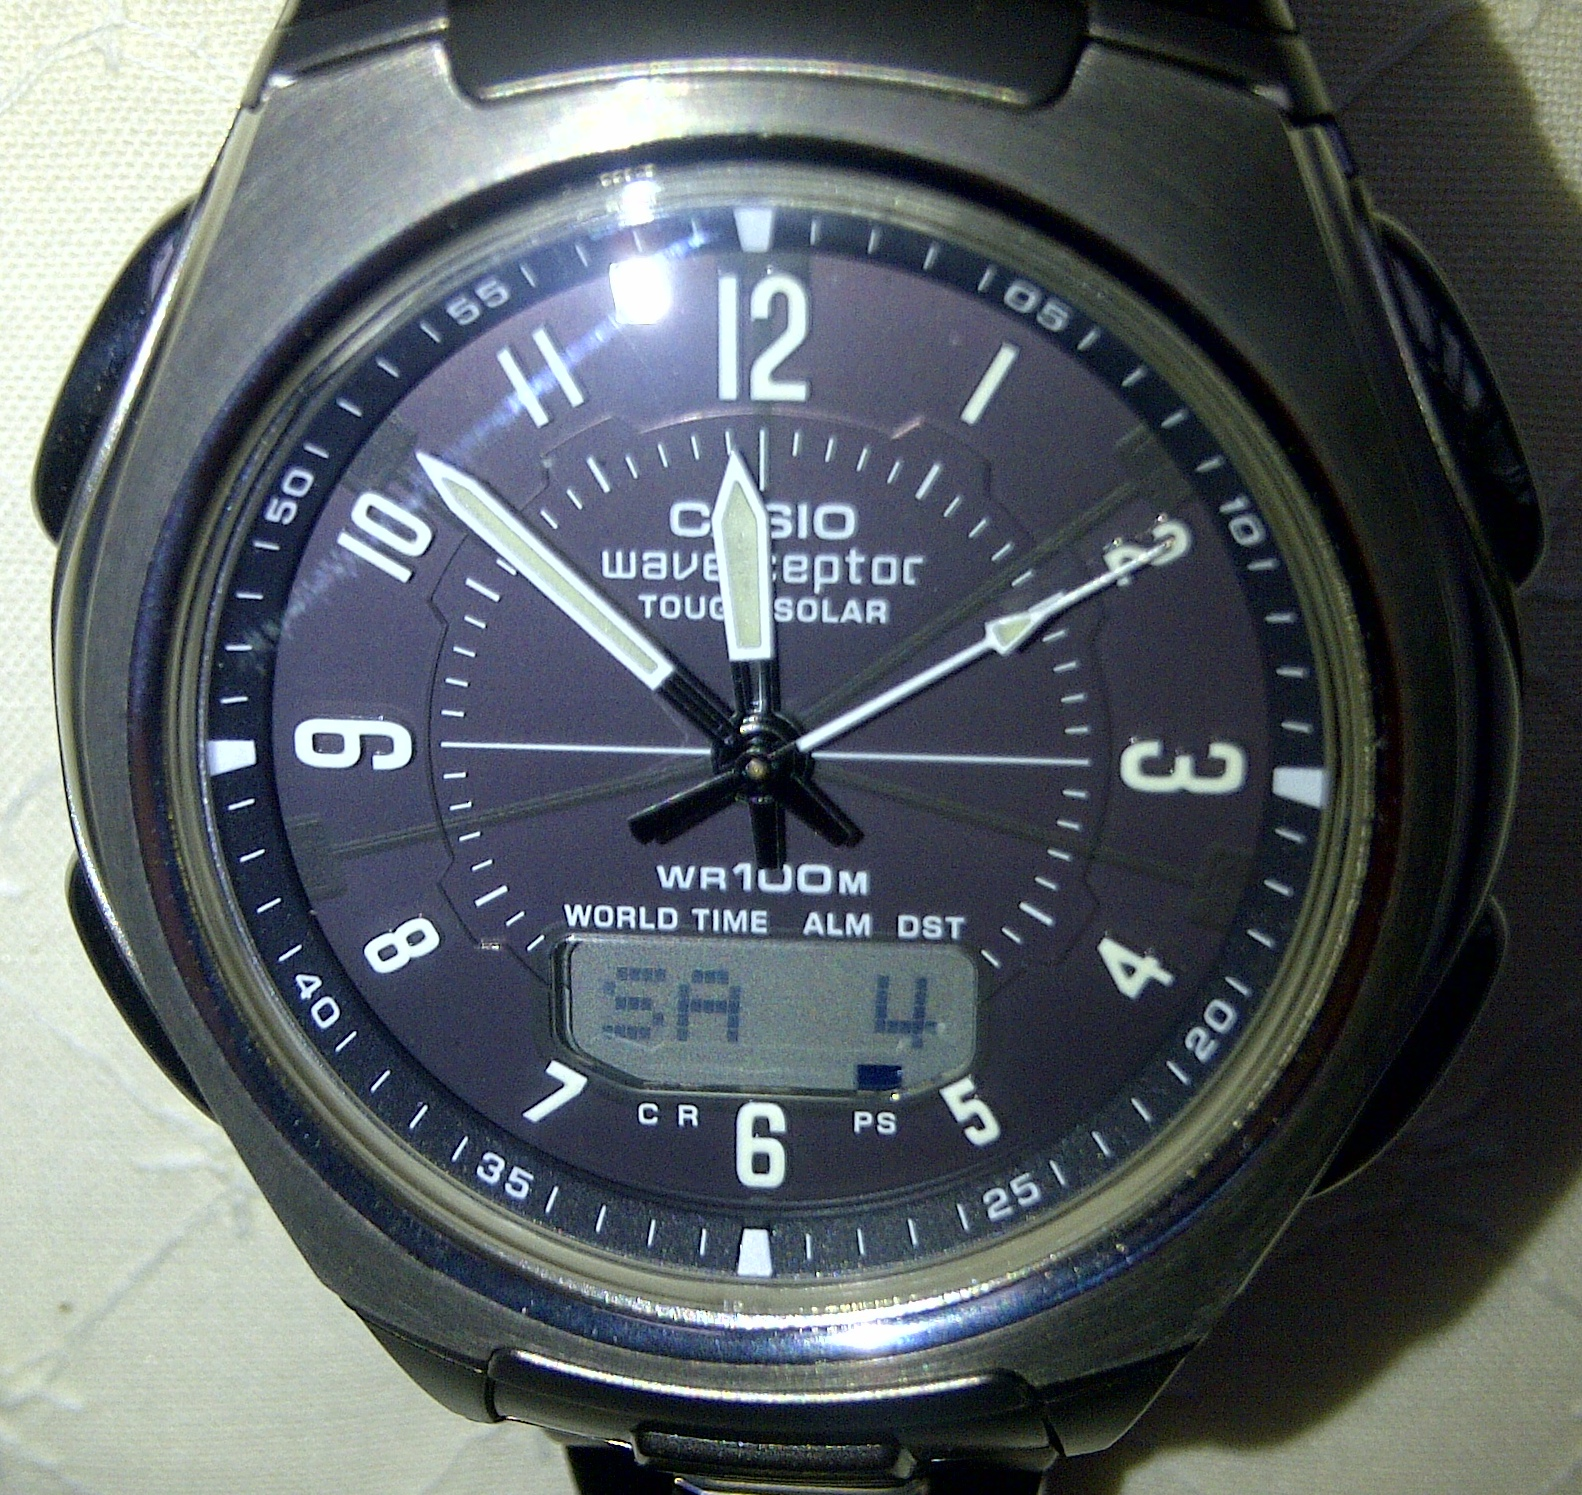 Gents Casio Wave Ceptor Alarm Chronograph Watch (WVA-430TDE-1A2VER) |  WatchShop.com™